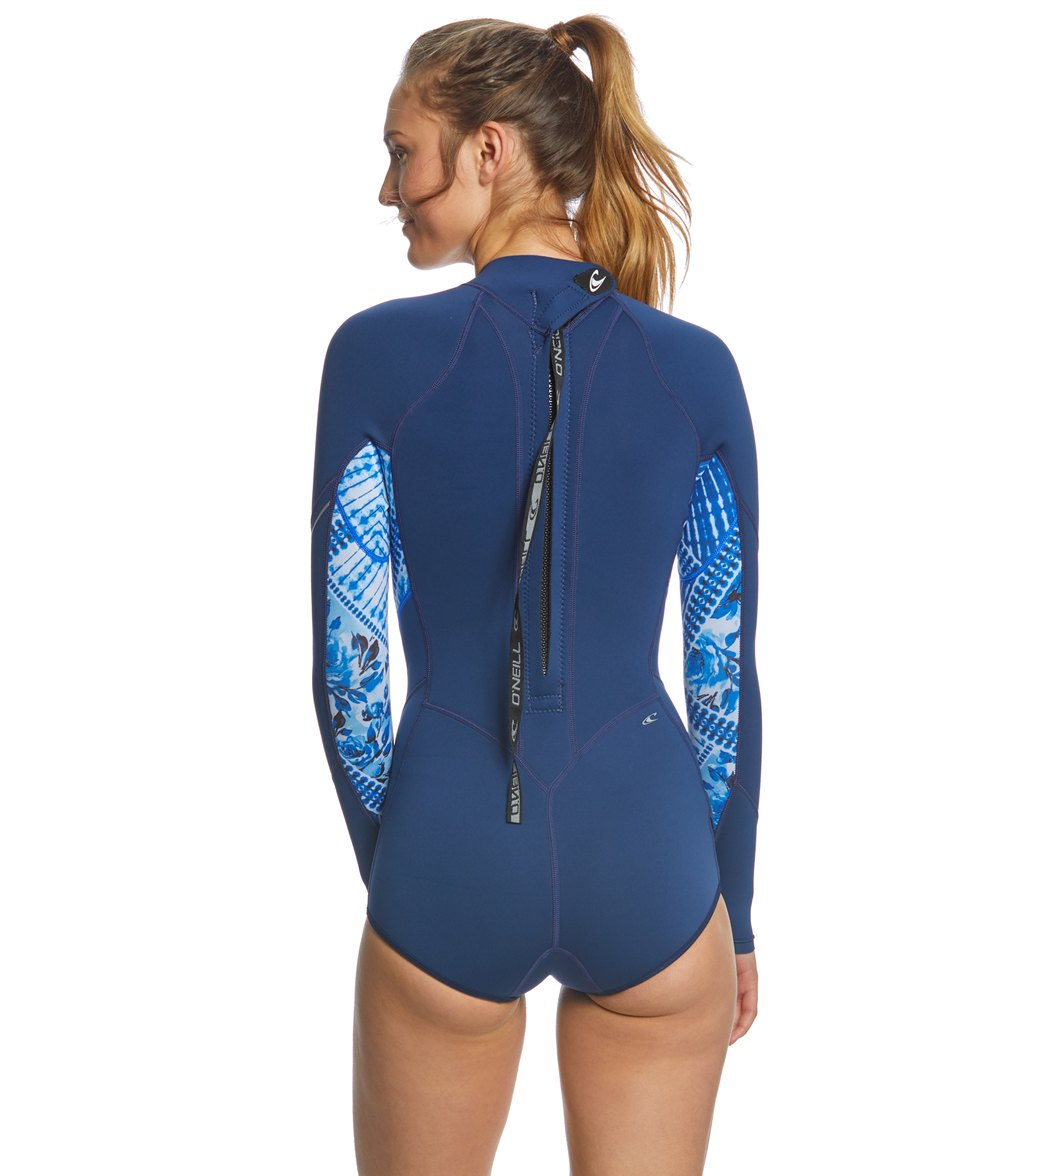 d4b27a4eab7e O'Neill Women's 2/1MM Bahia Long Sleeve Springsuit Wetsuit at ...